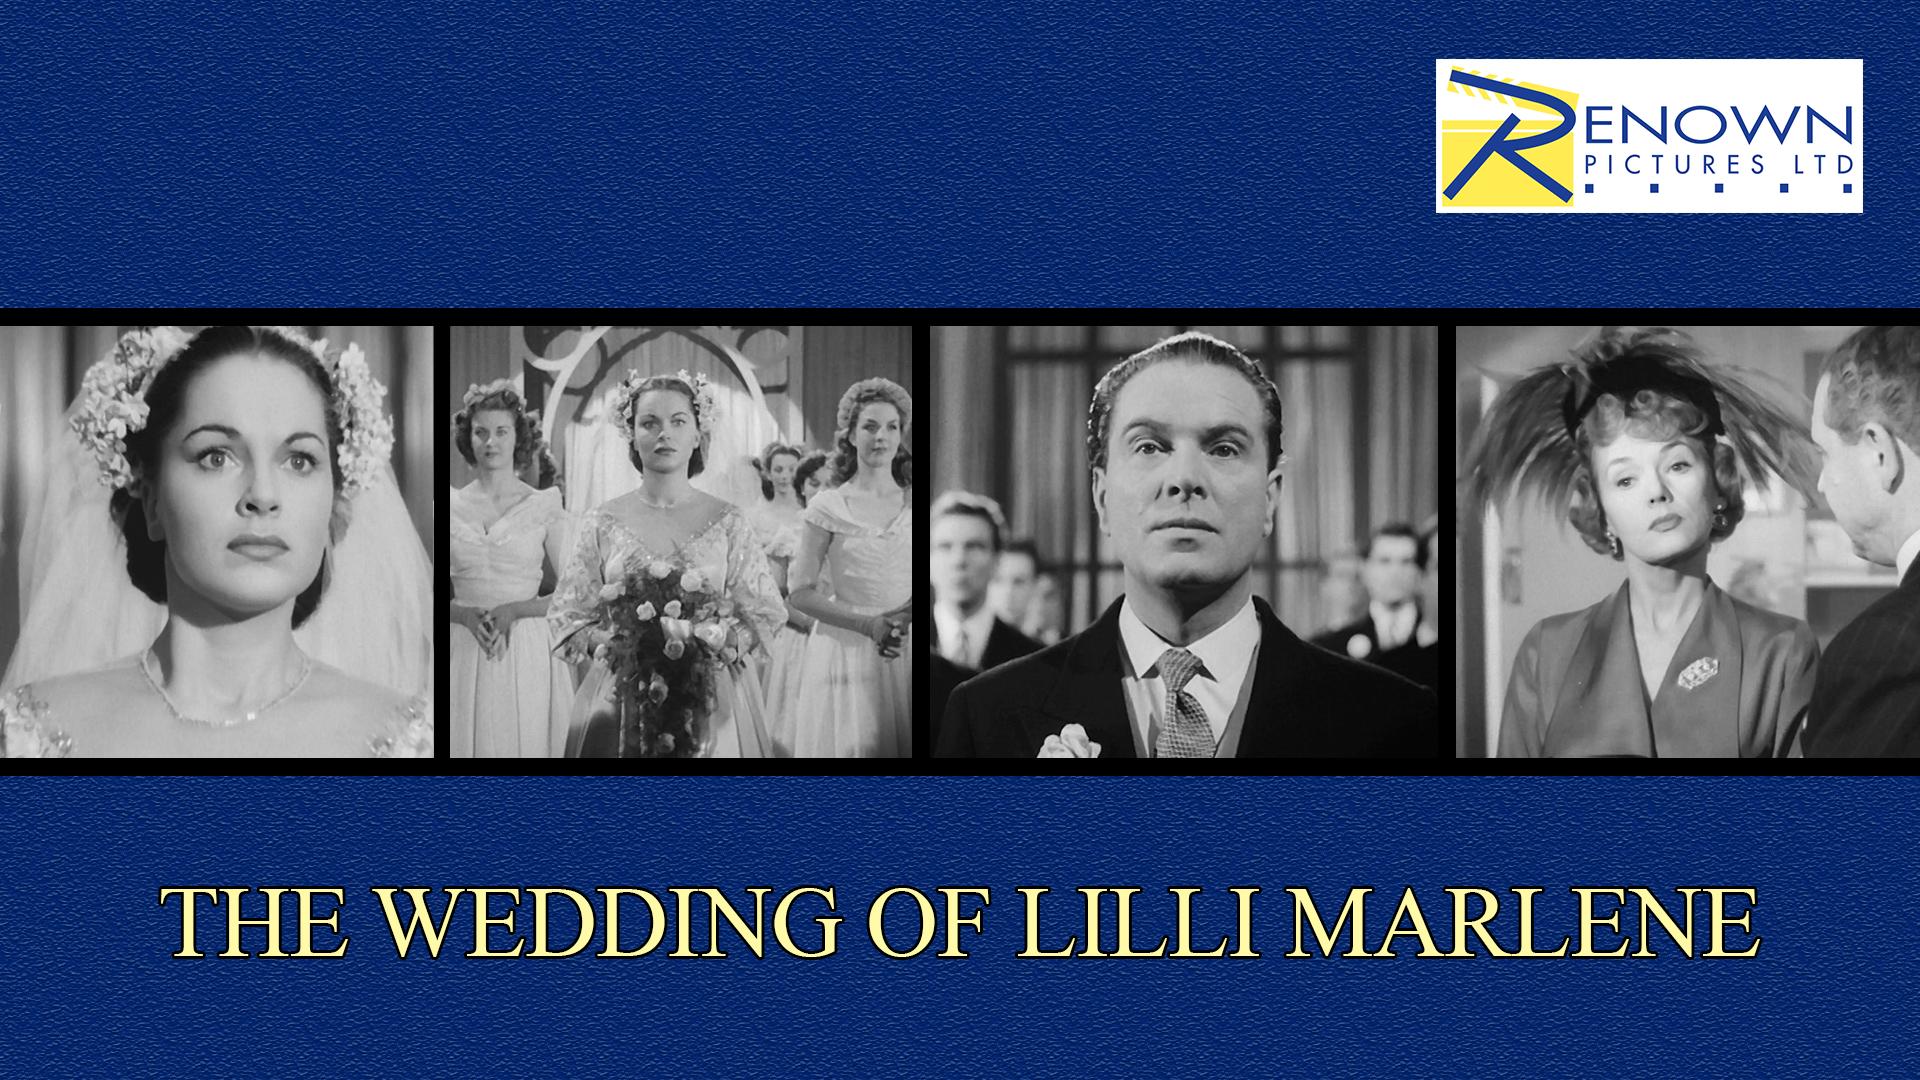 The Wedding Of Lilli Marlene